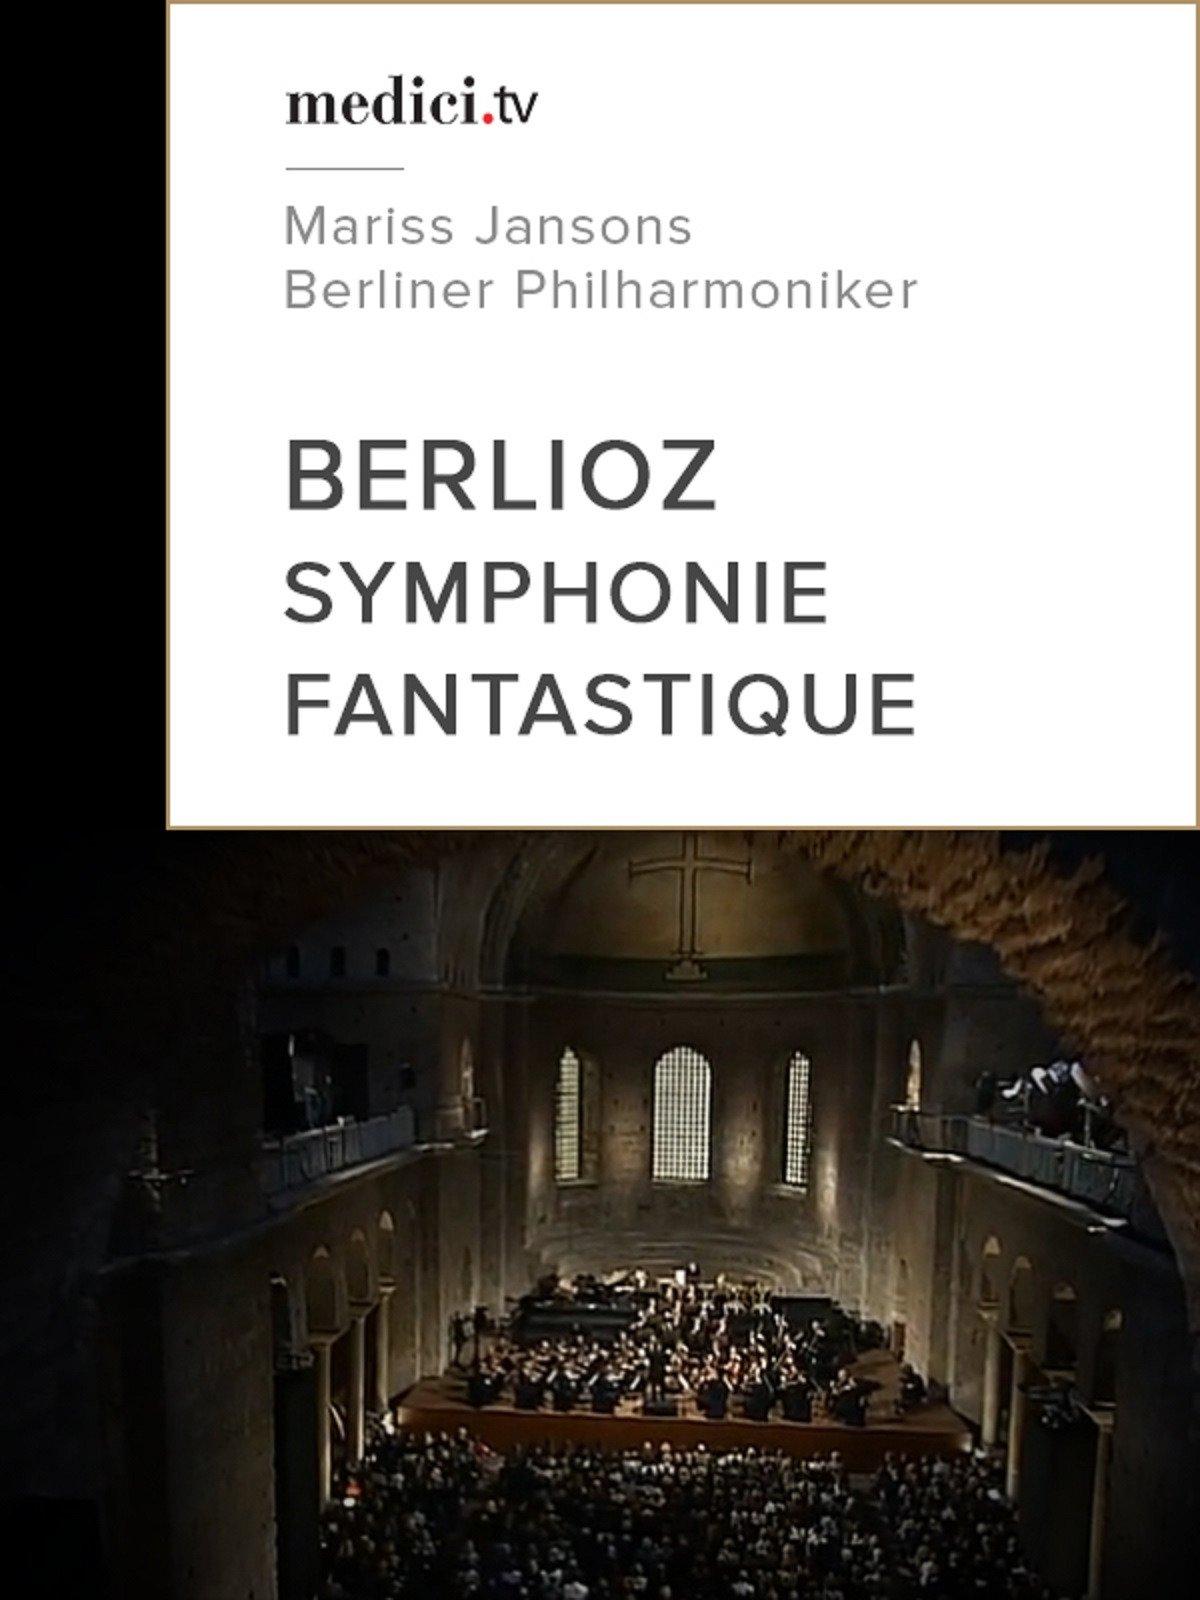 Berlioz, Symphonie fantastique